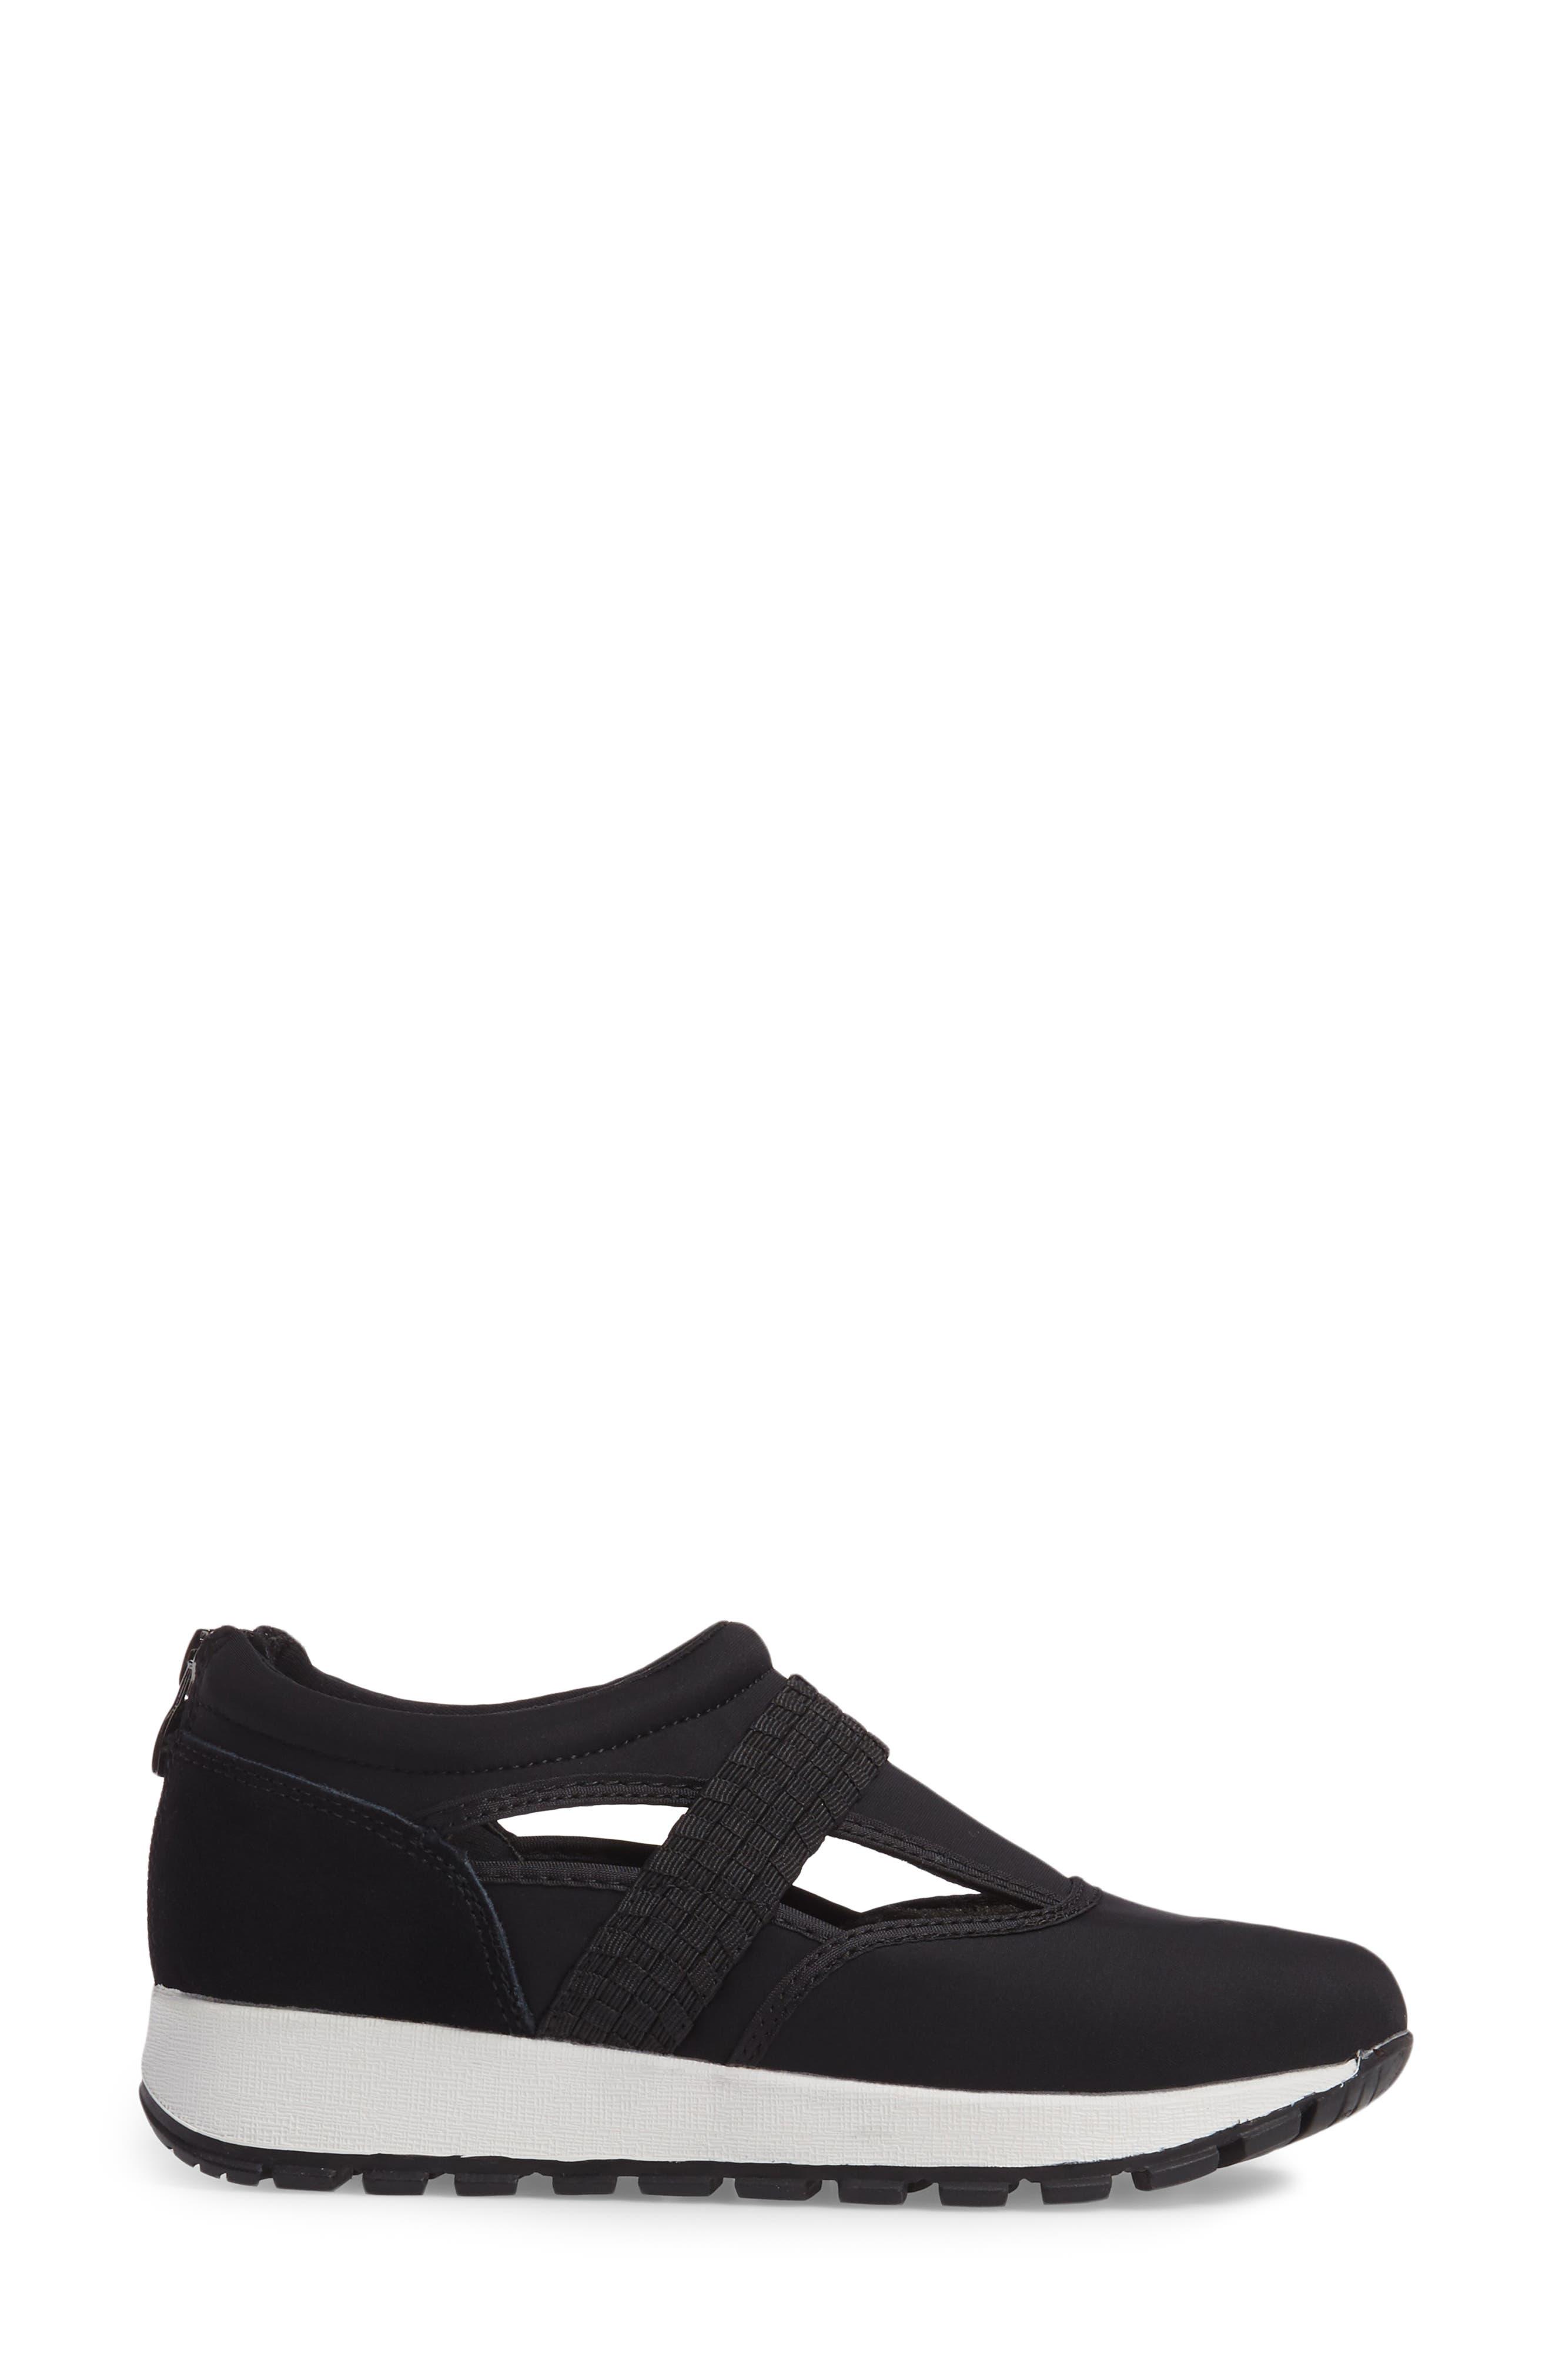 BERNIE MEV., Bernie Mev Janelle Sneaker, Alternate thumbnail 3, color, BLACK FABRIC